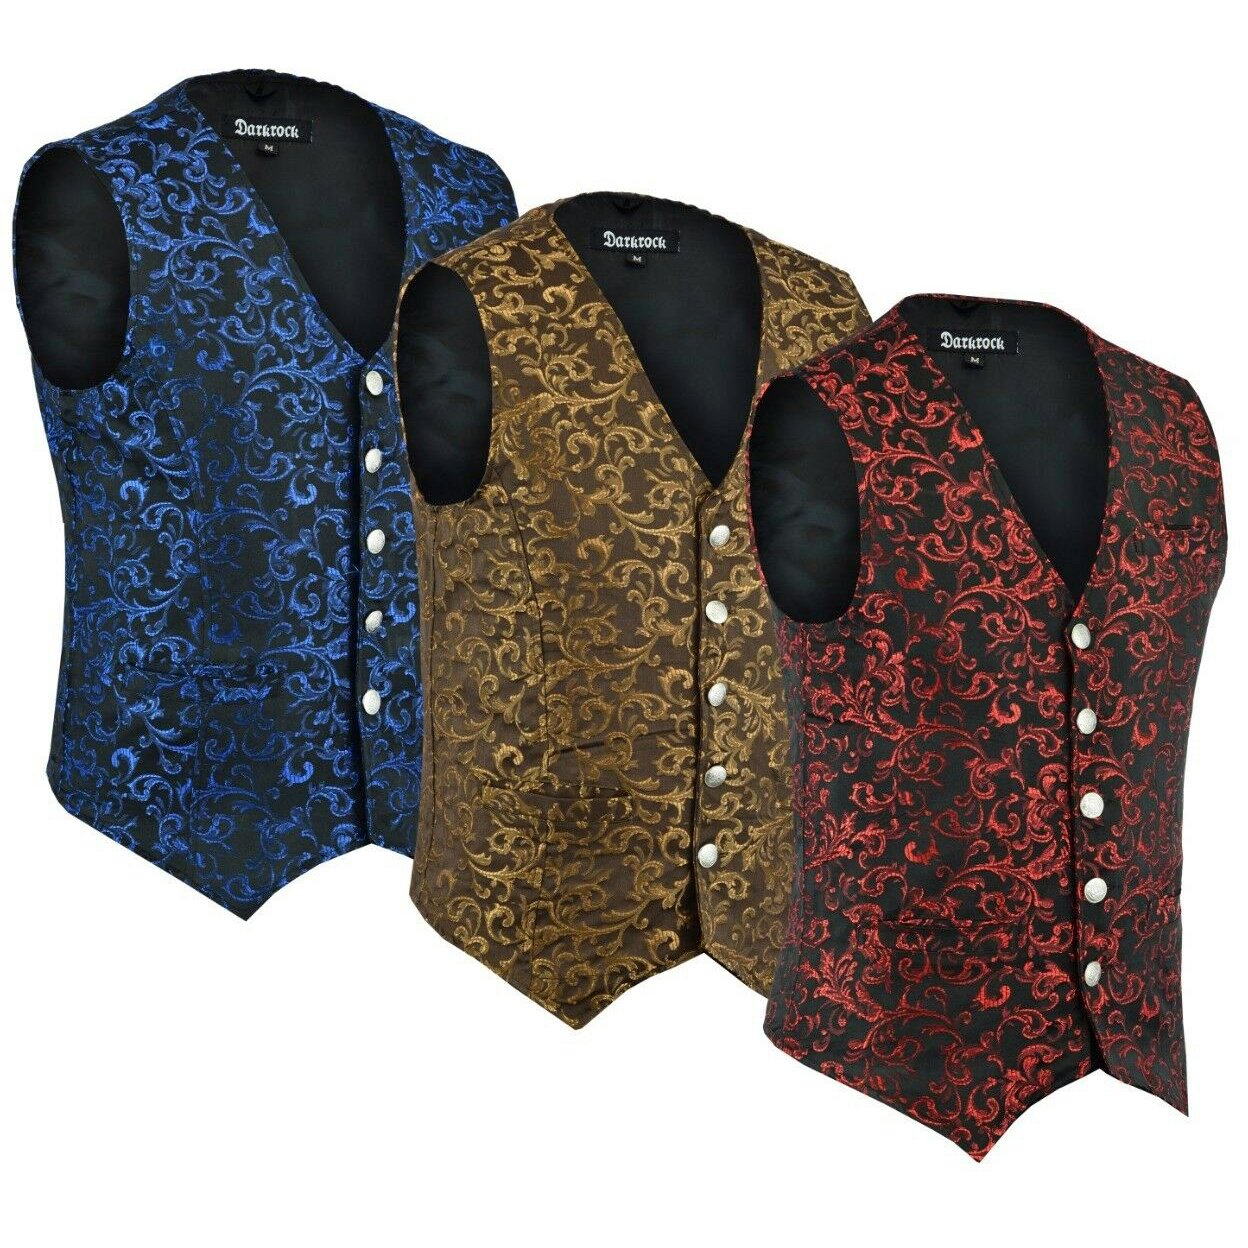 DARKROCK Designer Stylish Casual Brocade Vest - available colors